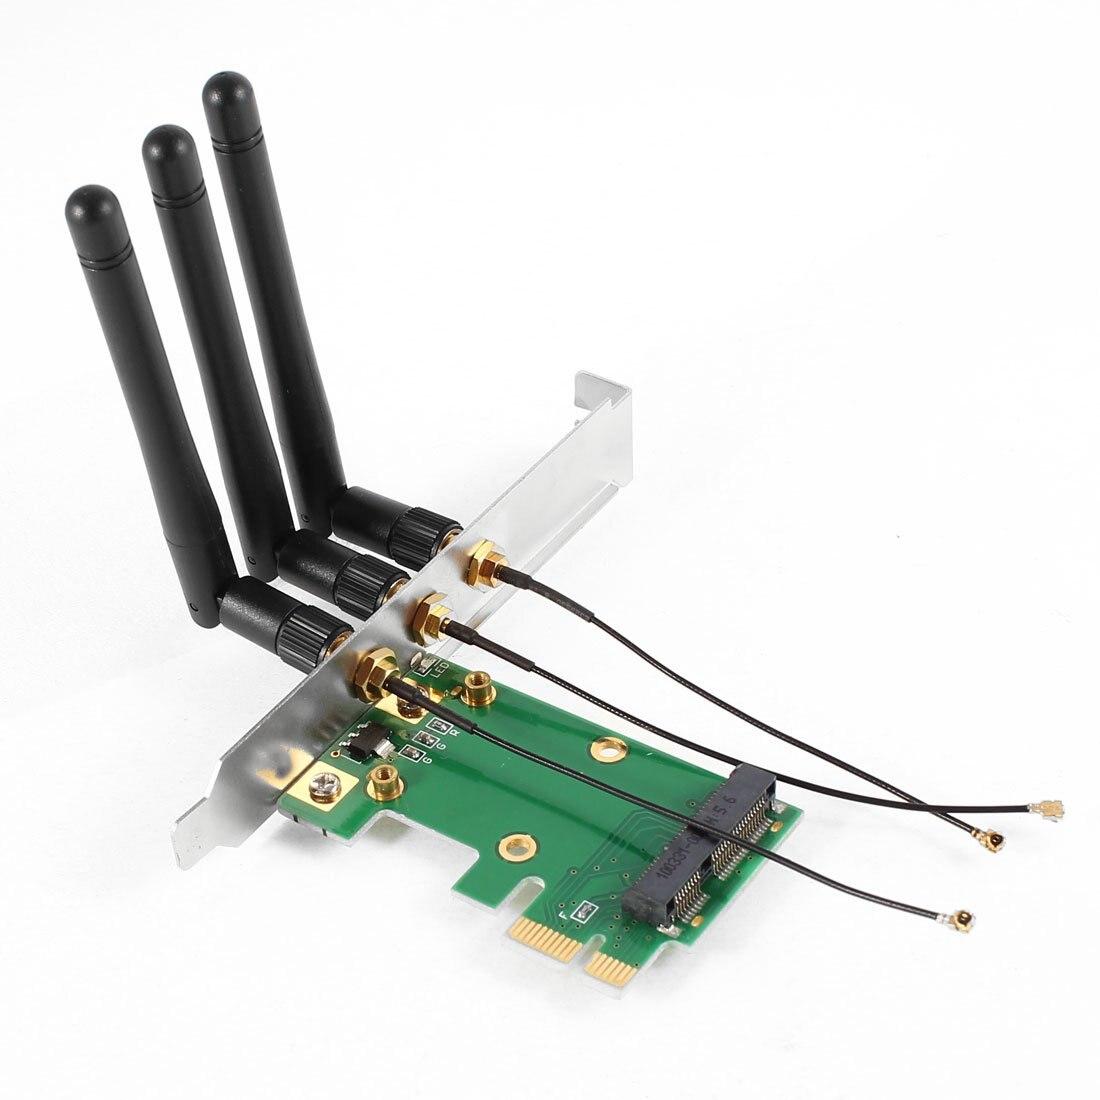 PROMOTION! Hot Mini PCI E Express to PCI E Wireless Adapter w 3 Antenna WiFi for PC